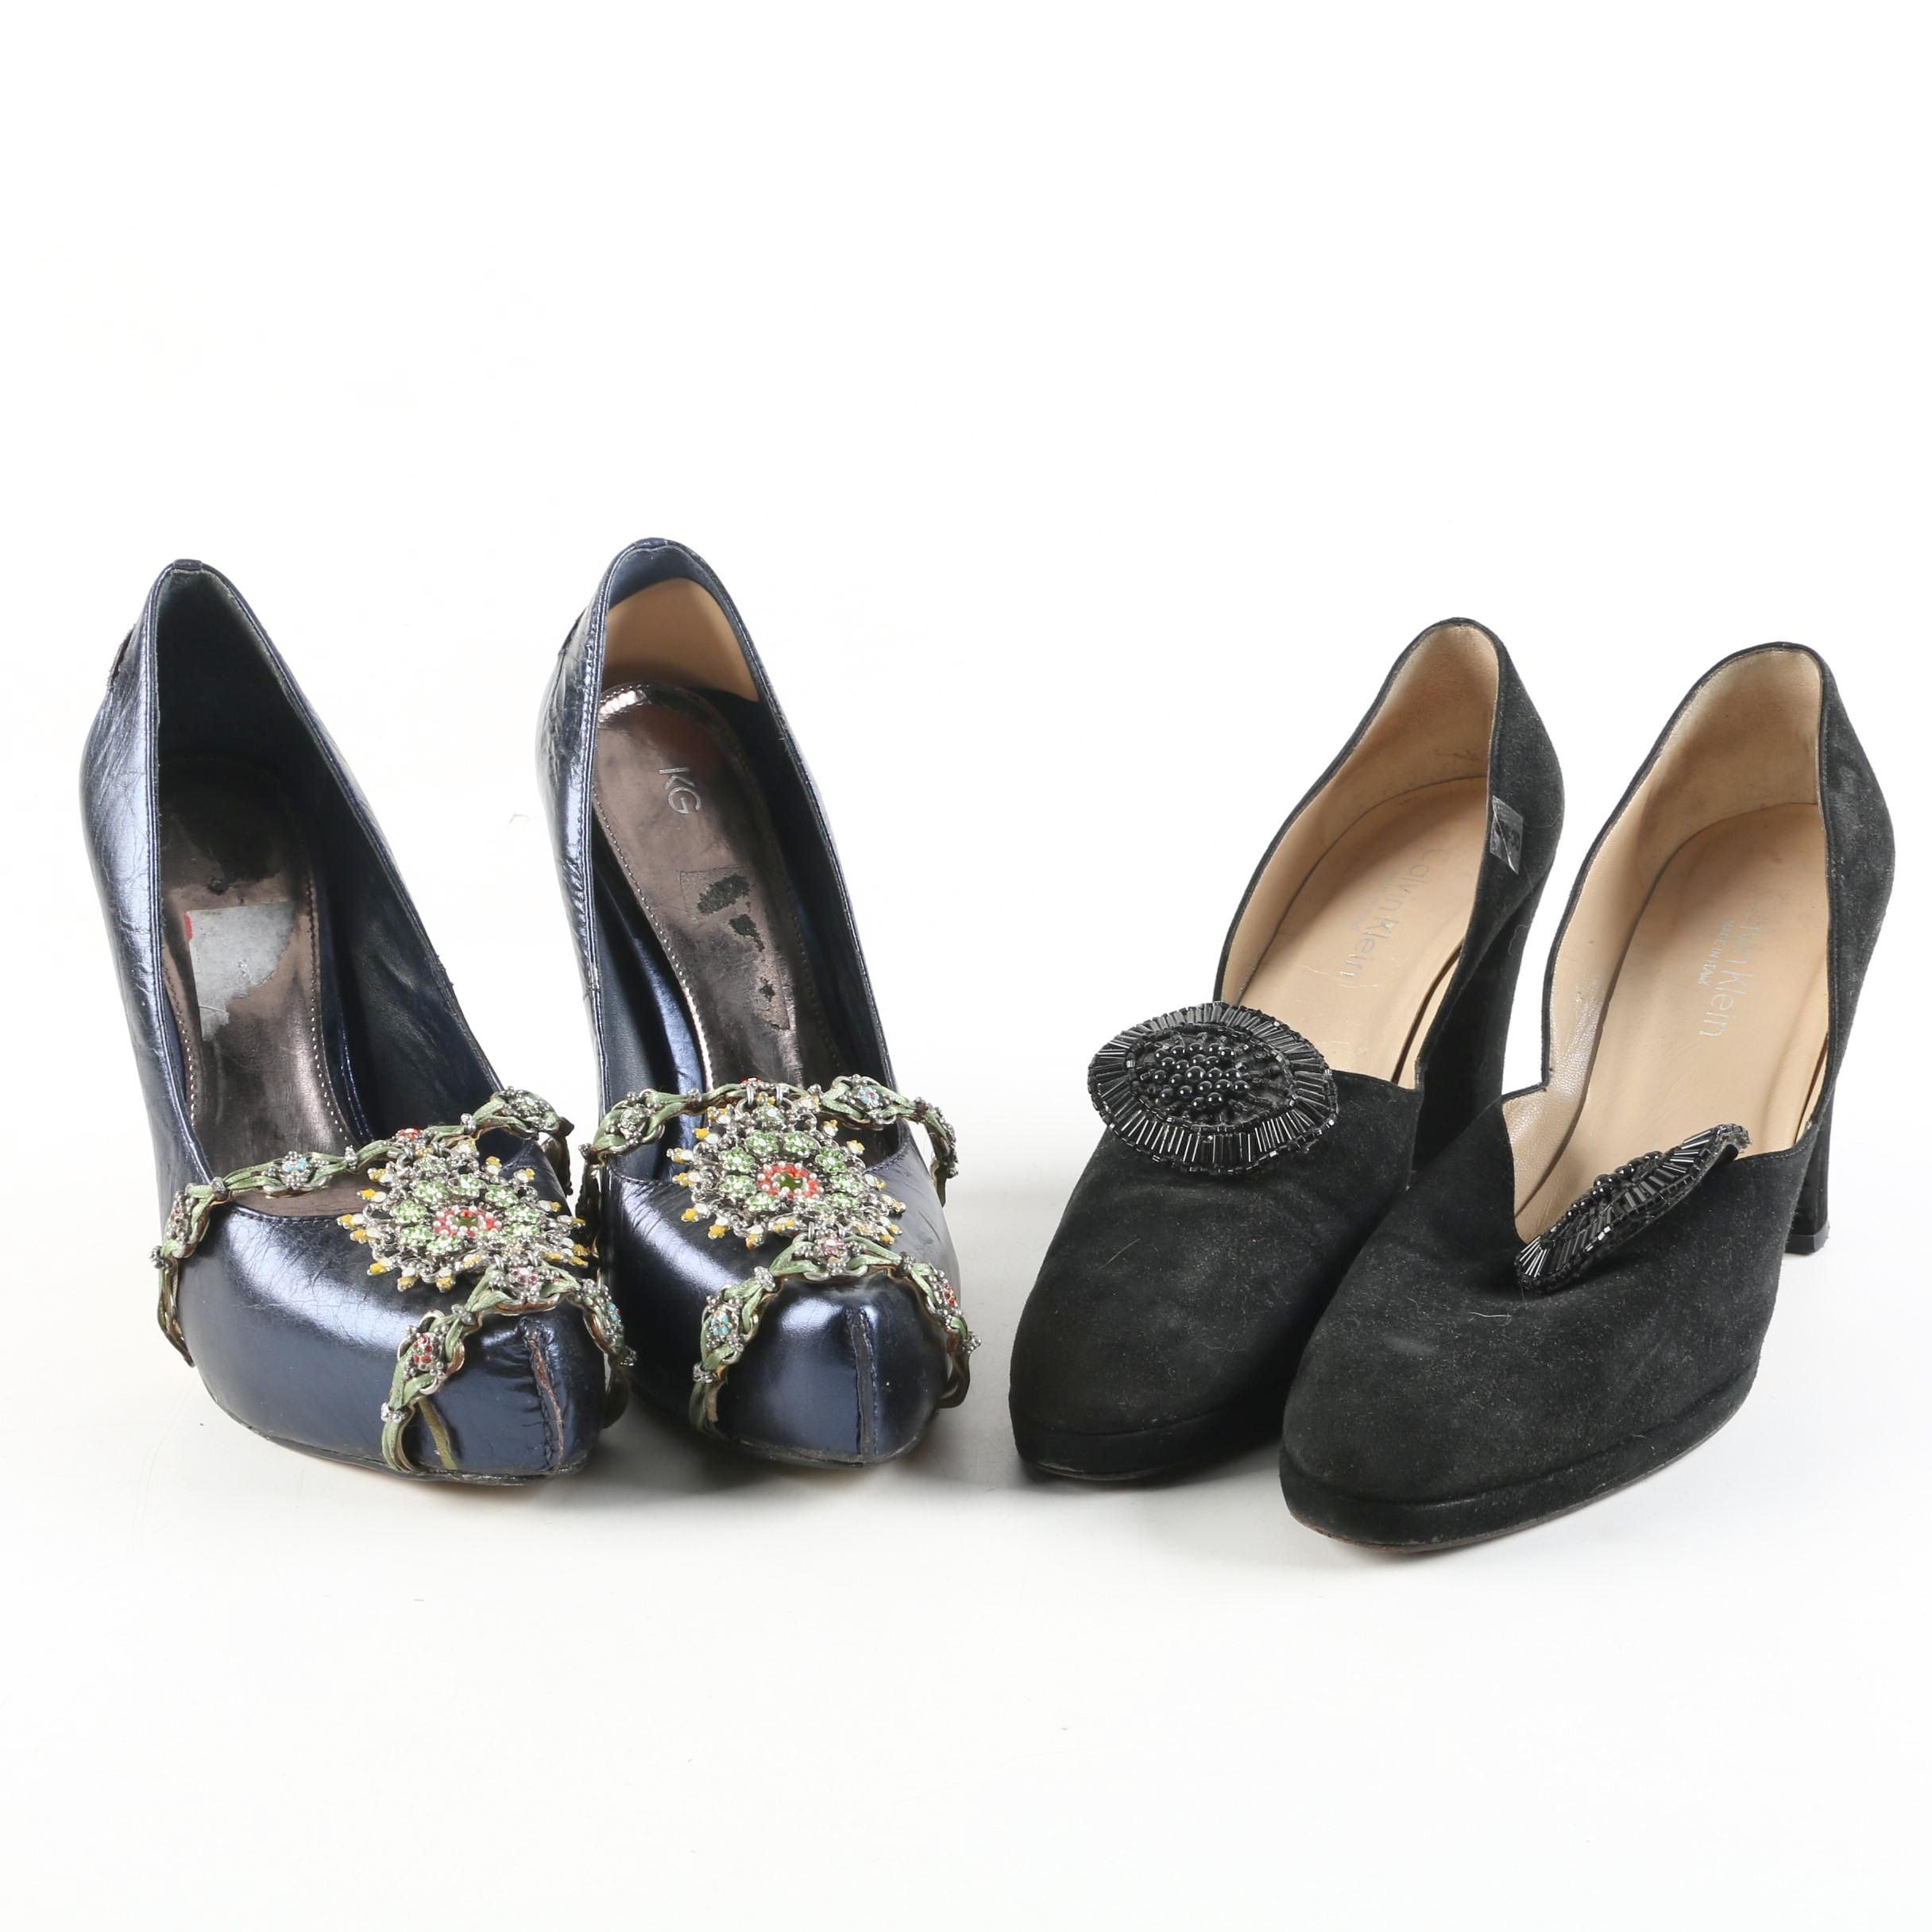 Calvin Klein and KG Embellished High-Heeled Shoes